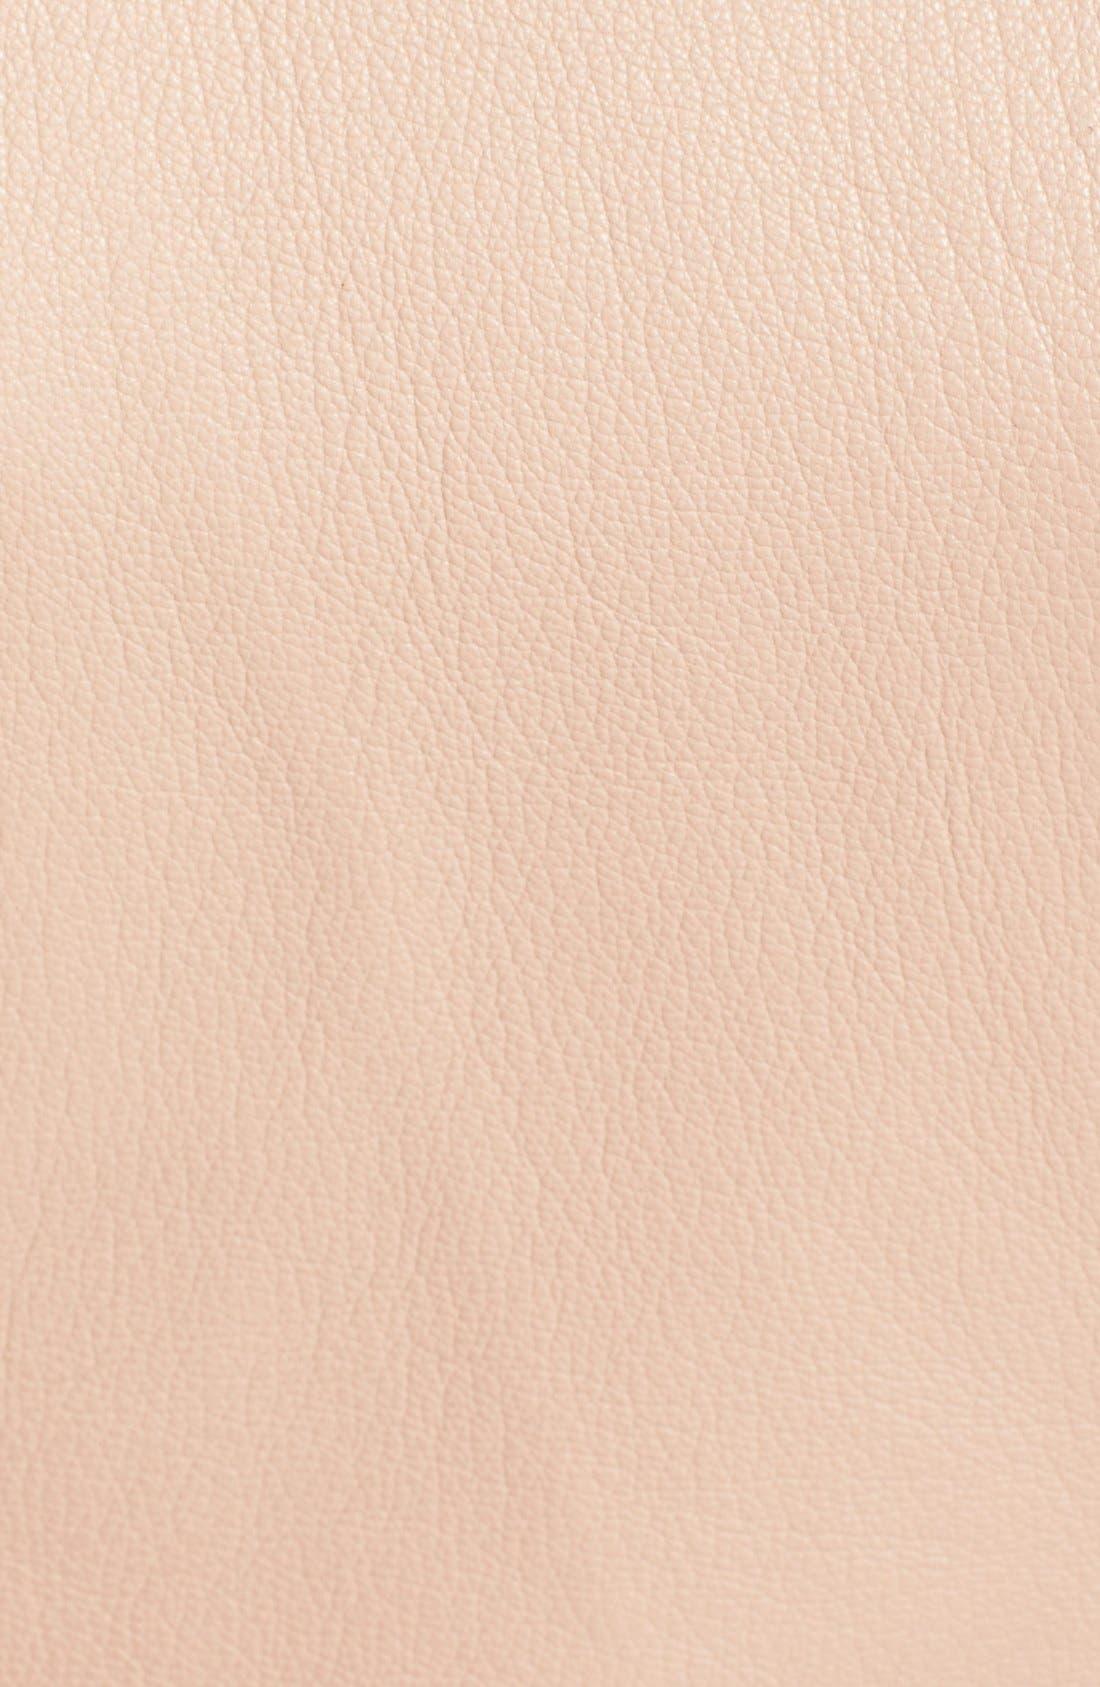 Alternate Image 3  - Herve Leger 'Mila' Ruffle Detail Lambskin Leather Jacket